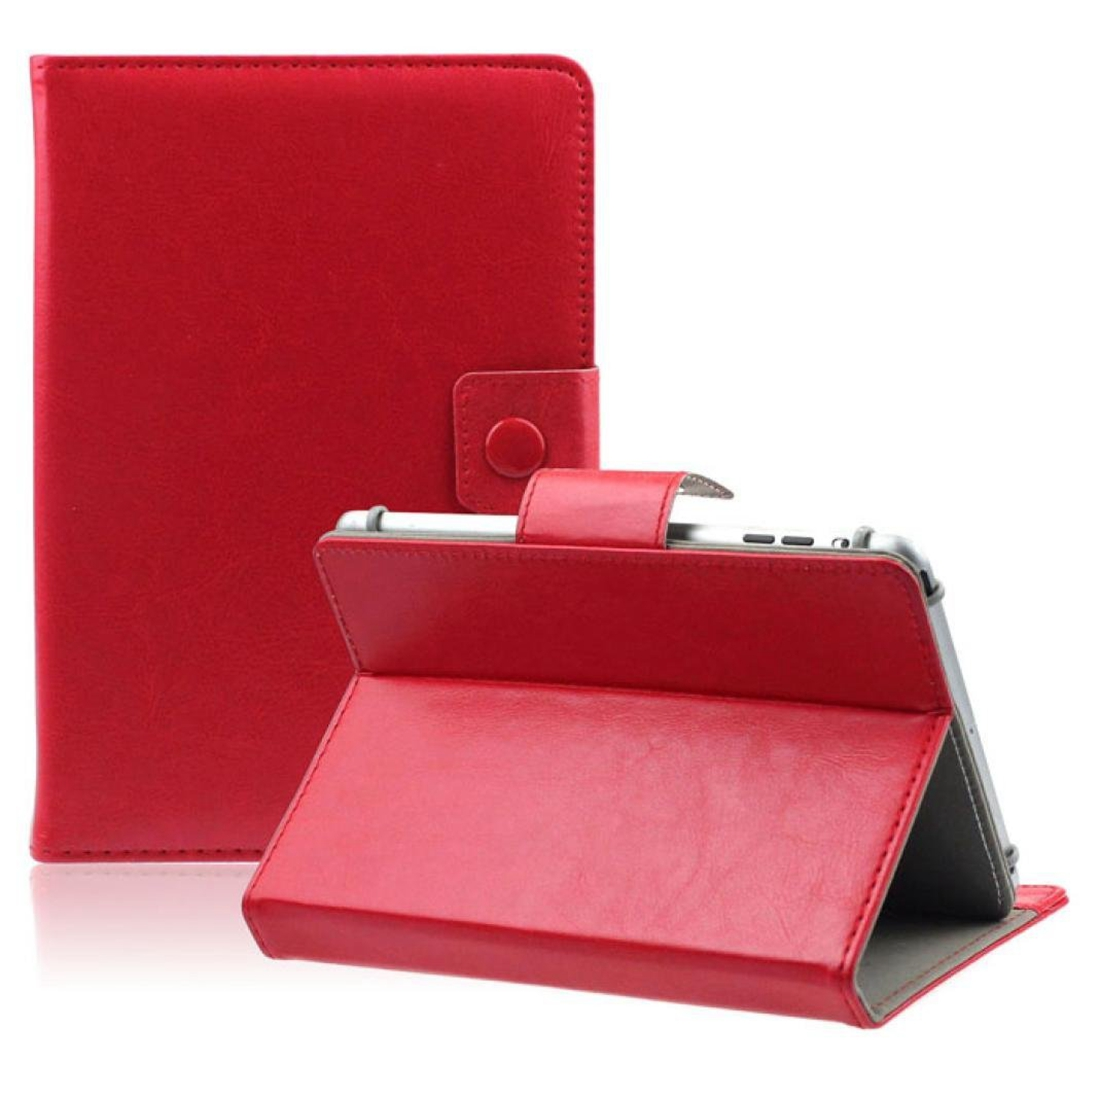 9 Inch Universal Tablet PC Case Crystal PU Leather Support Case планшет модель g15 gpad tablet pc в донецке недорого